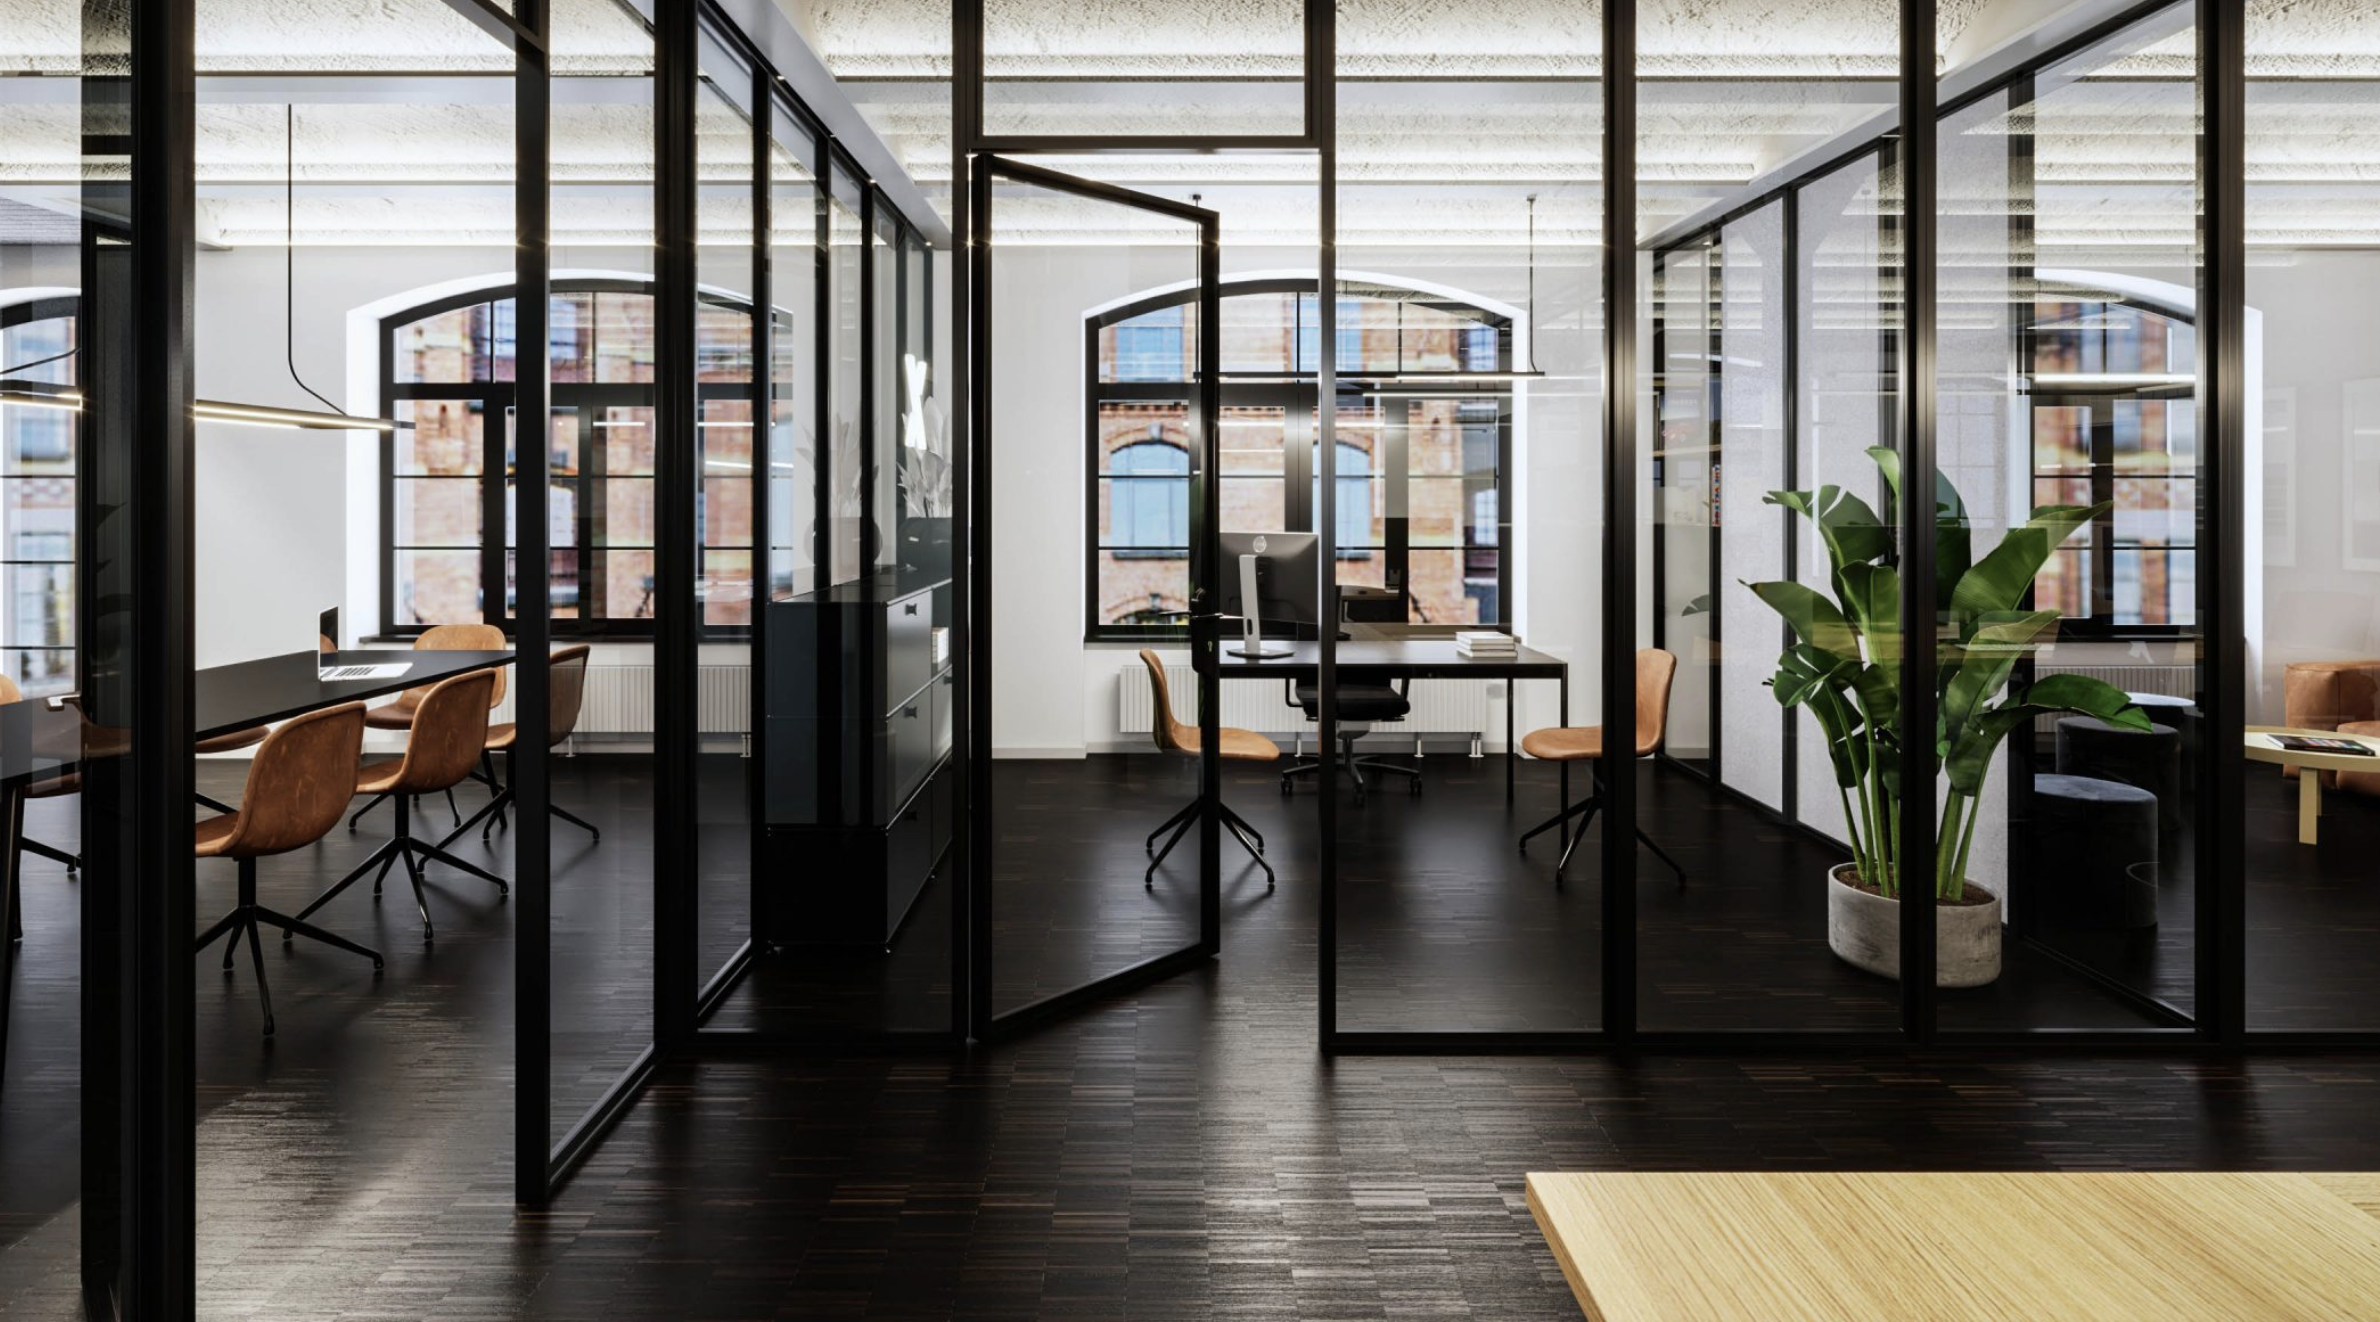 Design 4 room And Its Inspiring Office Designs design 4 room Design 4 room And Its Inspiring Office Designs Captura de ecra   2020 12 02 a  s 15